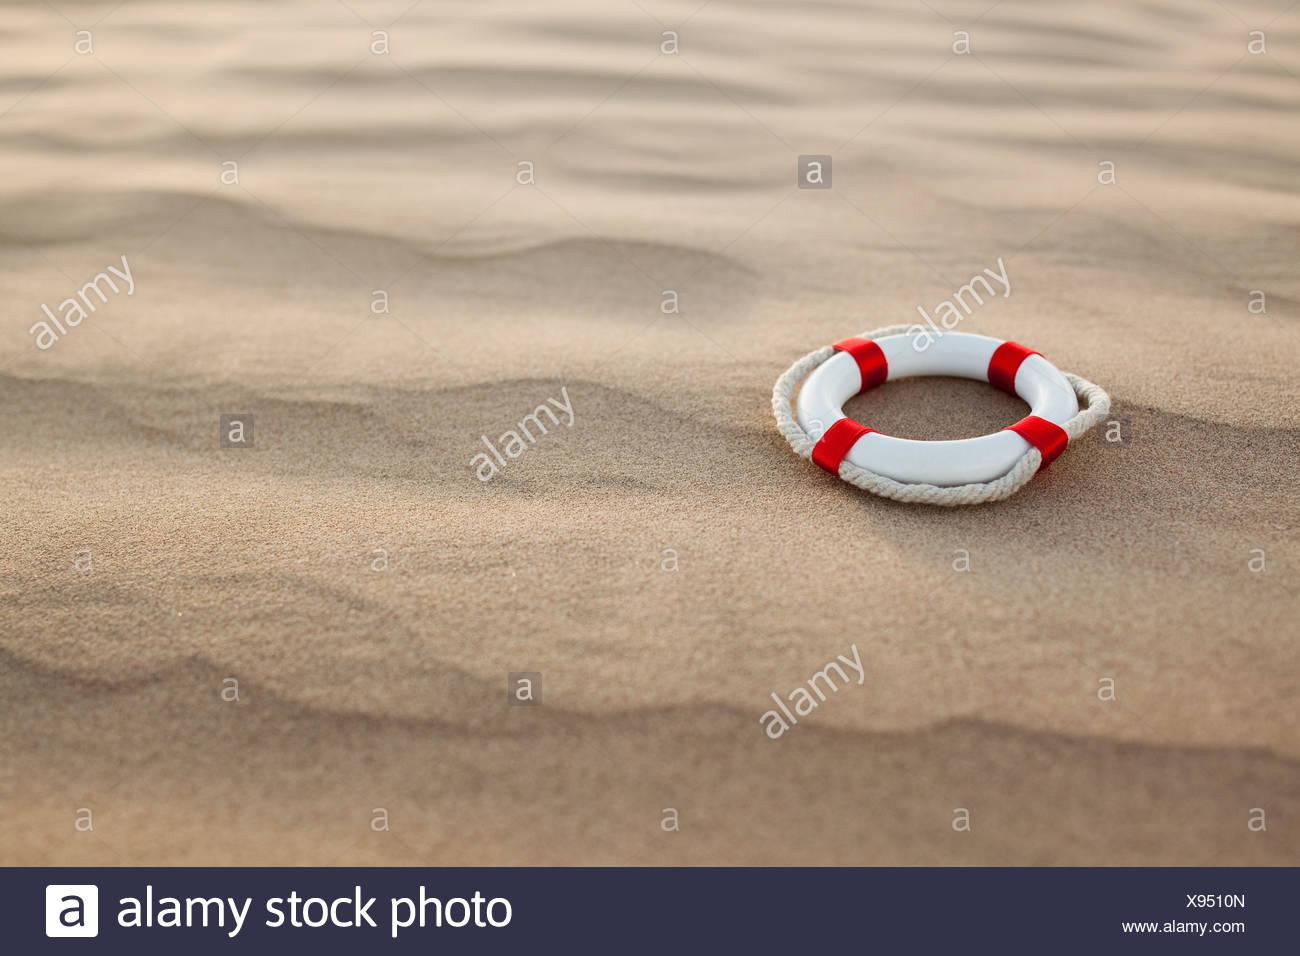 Lifebuoy in desert Stock Photo